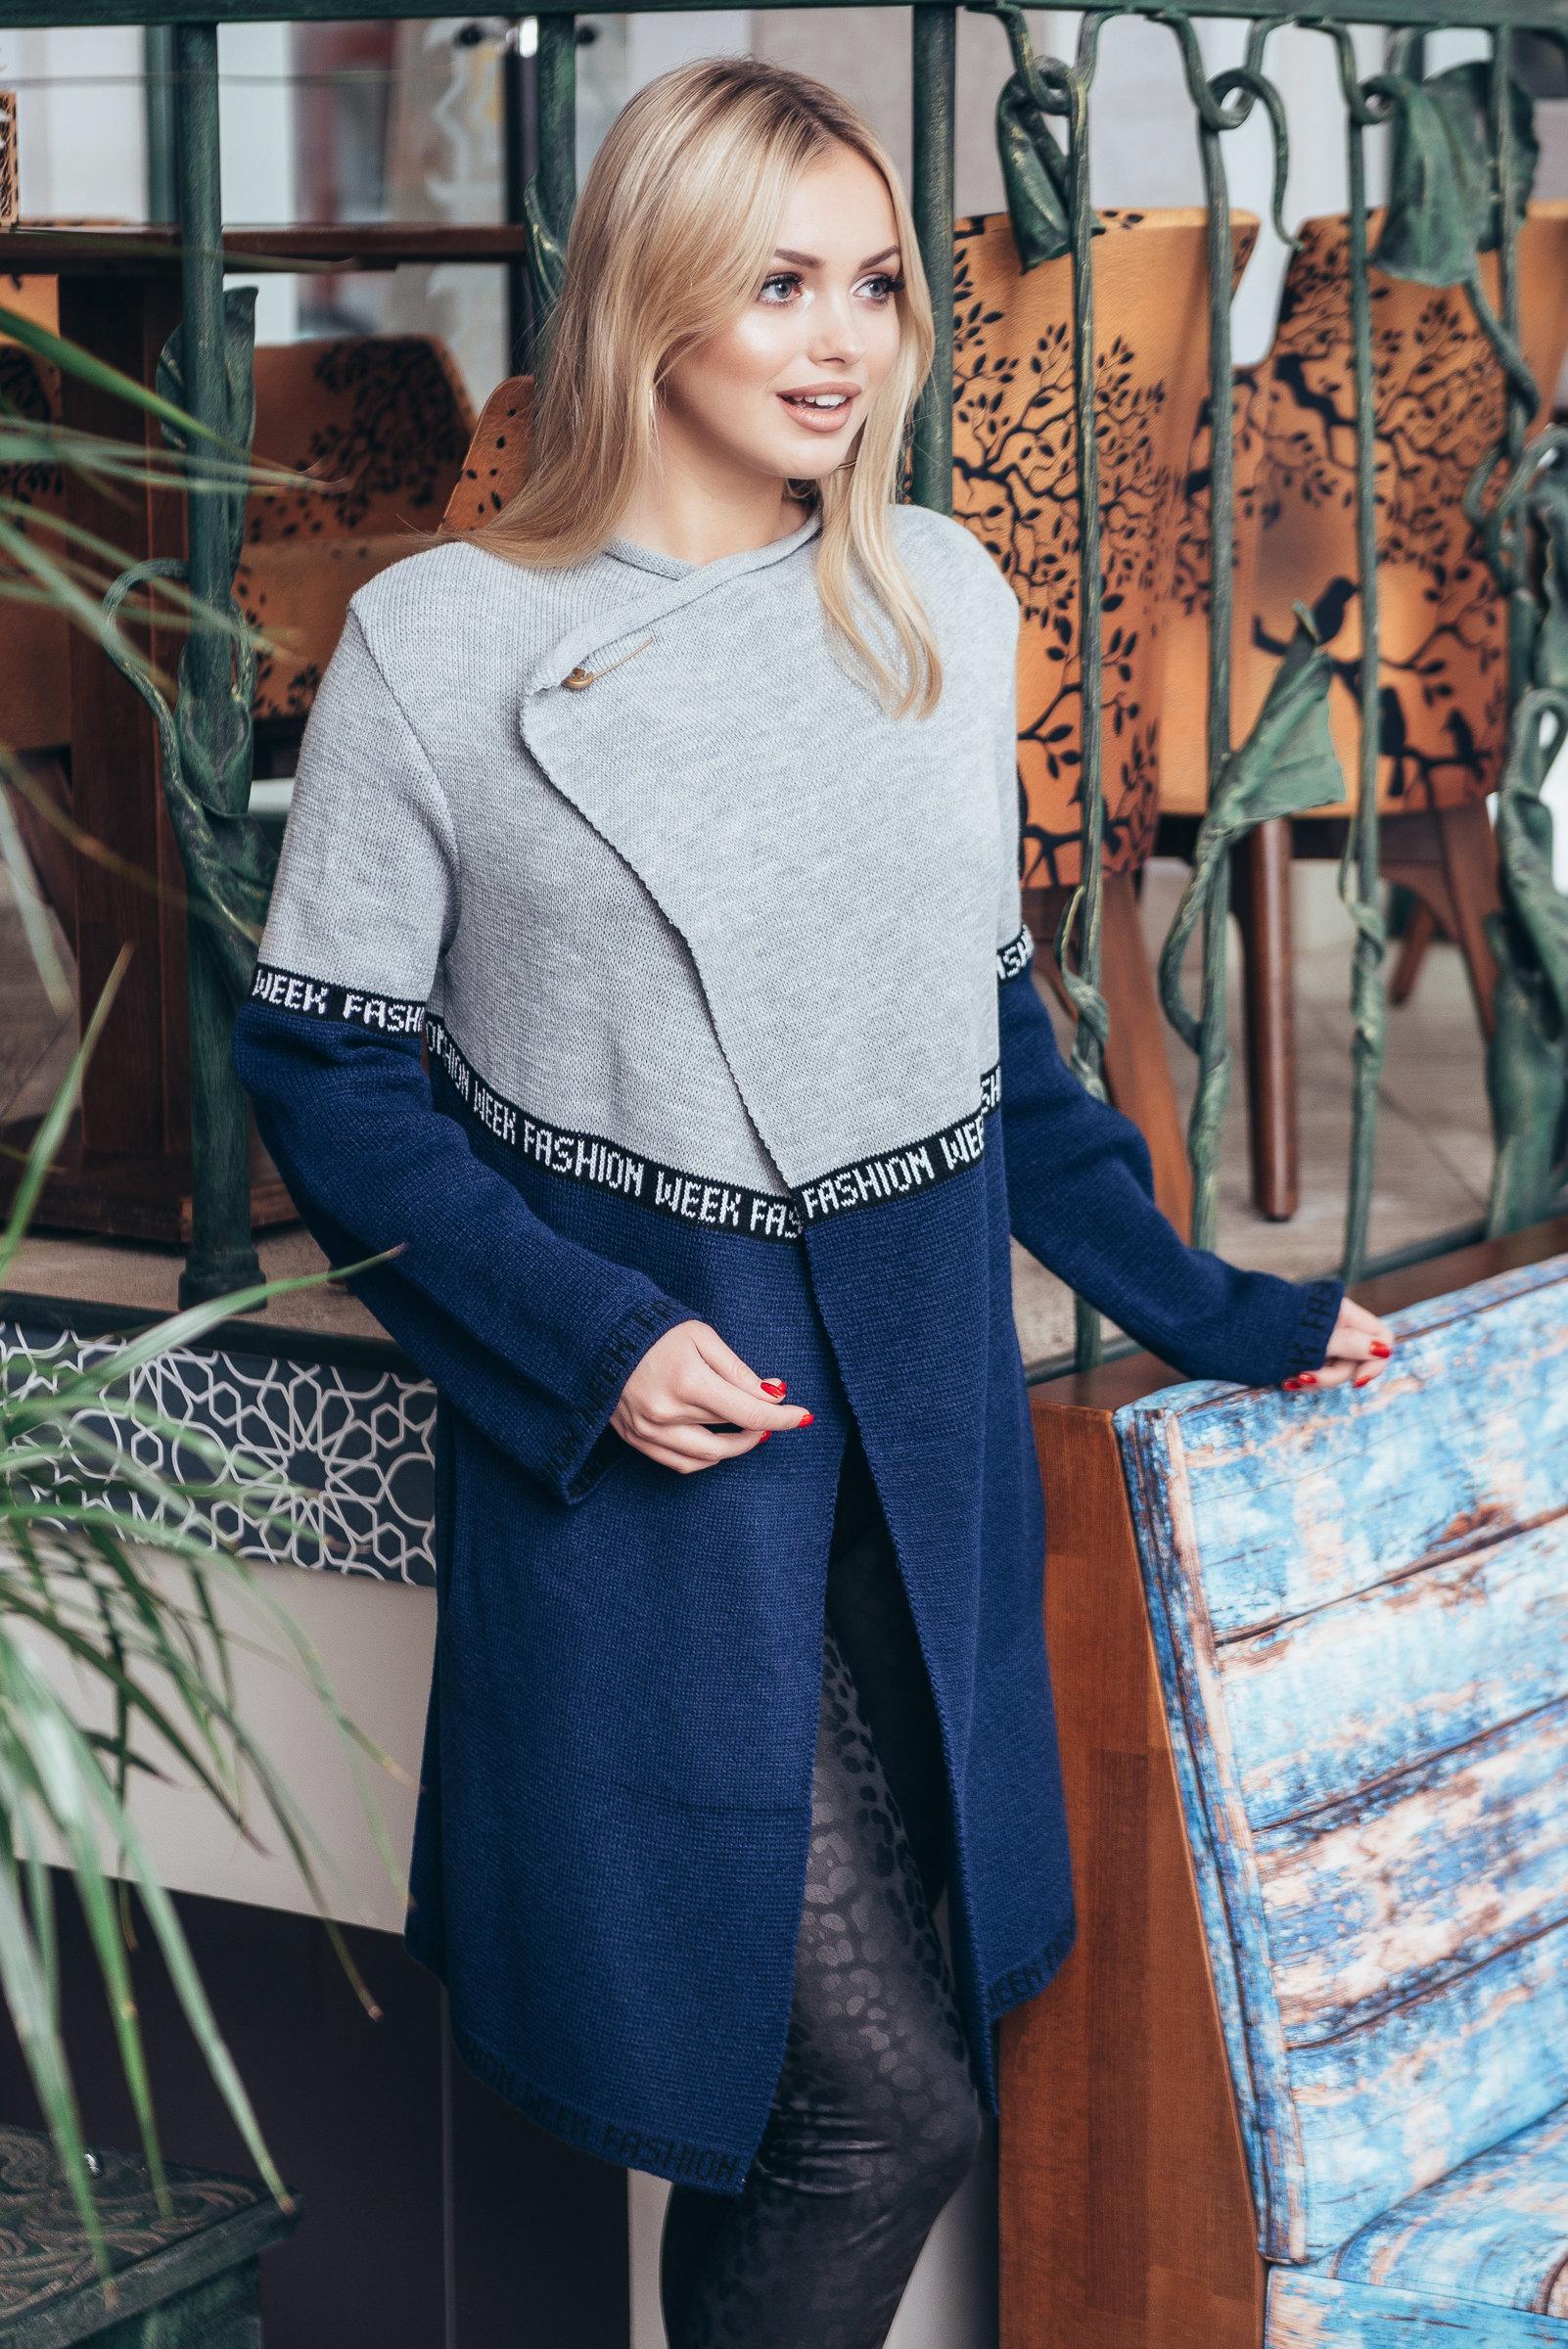 вязаный кардиган с лампасами Fashionweek серый синий